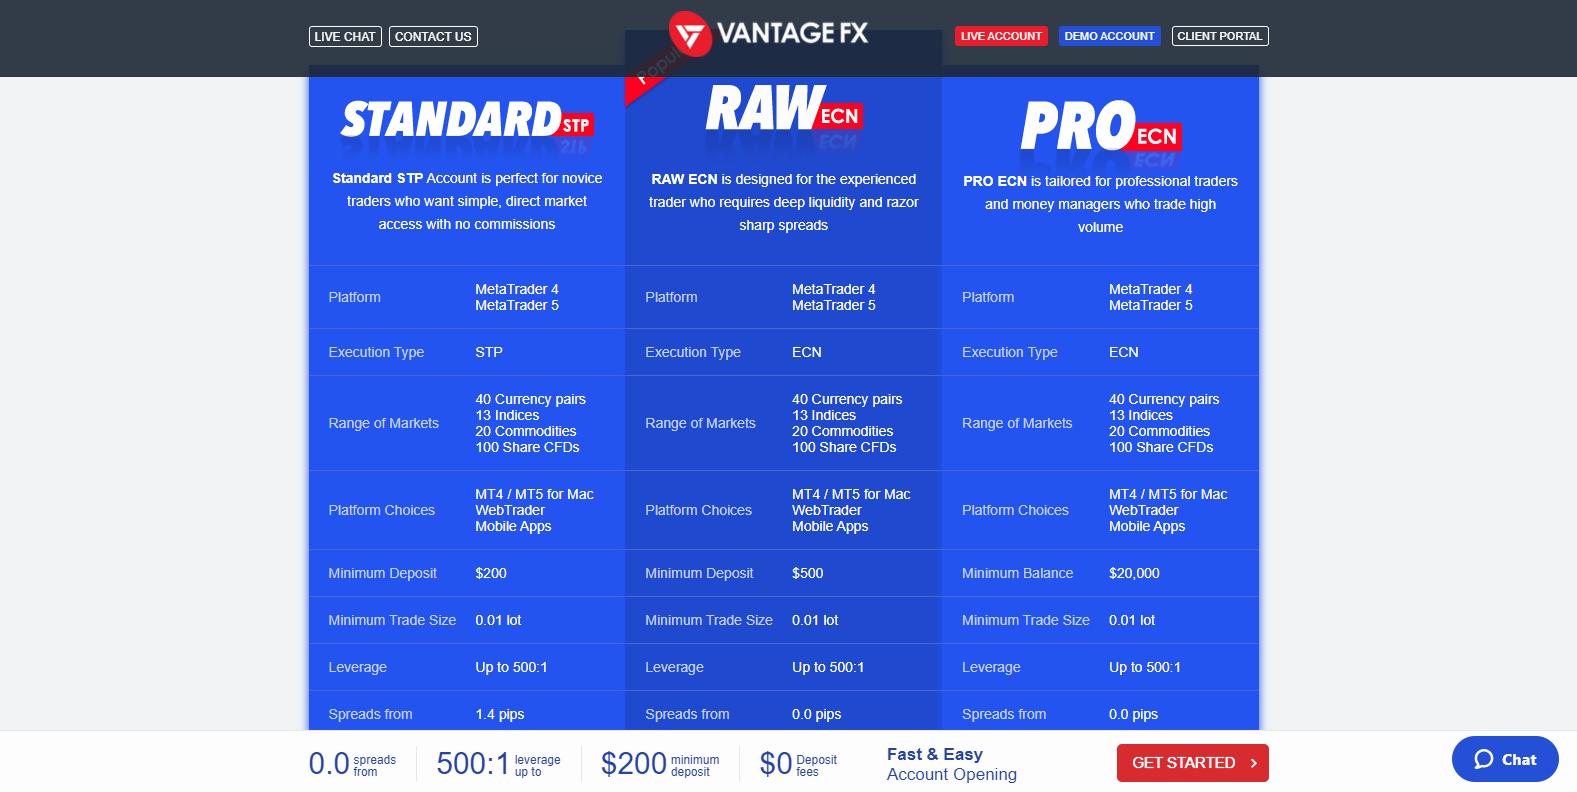 Vantage FX market conditions